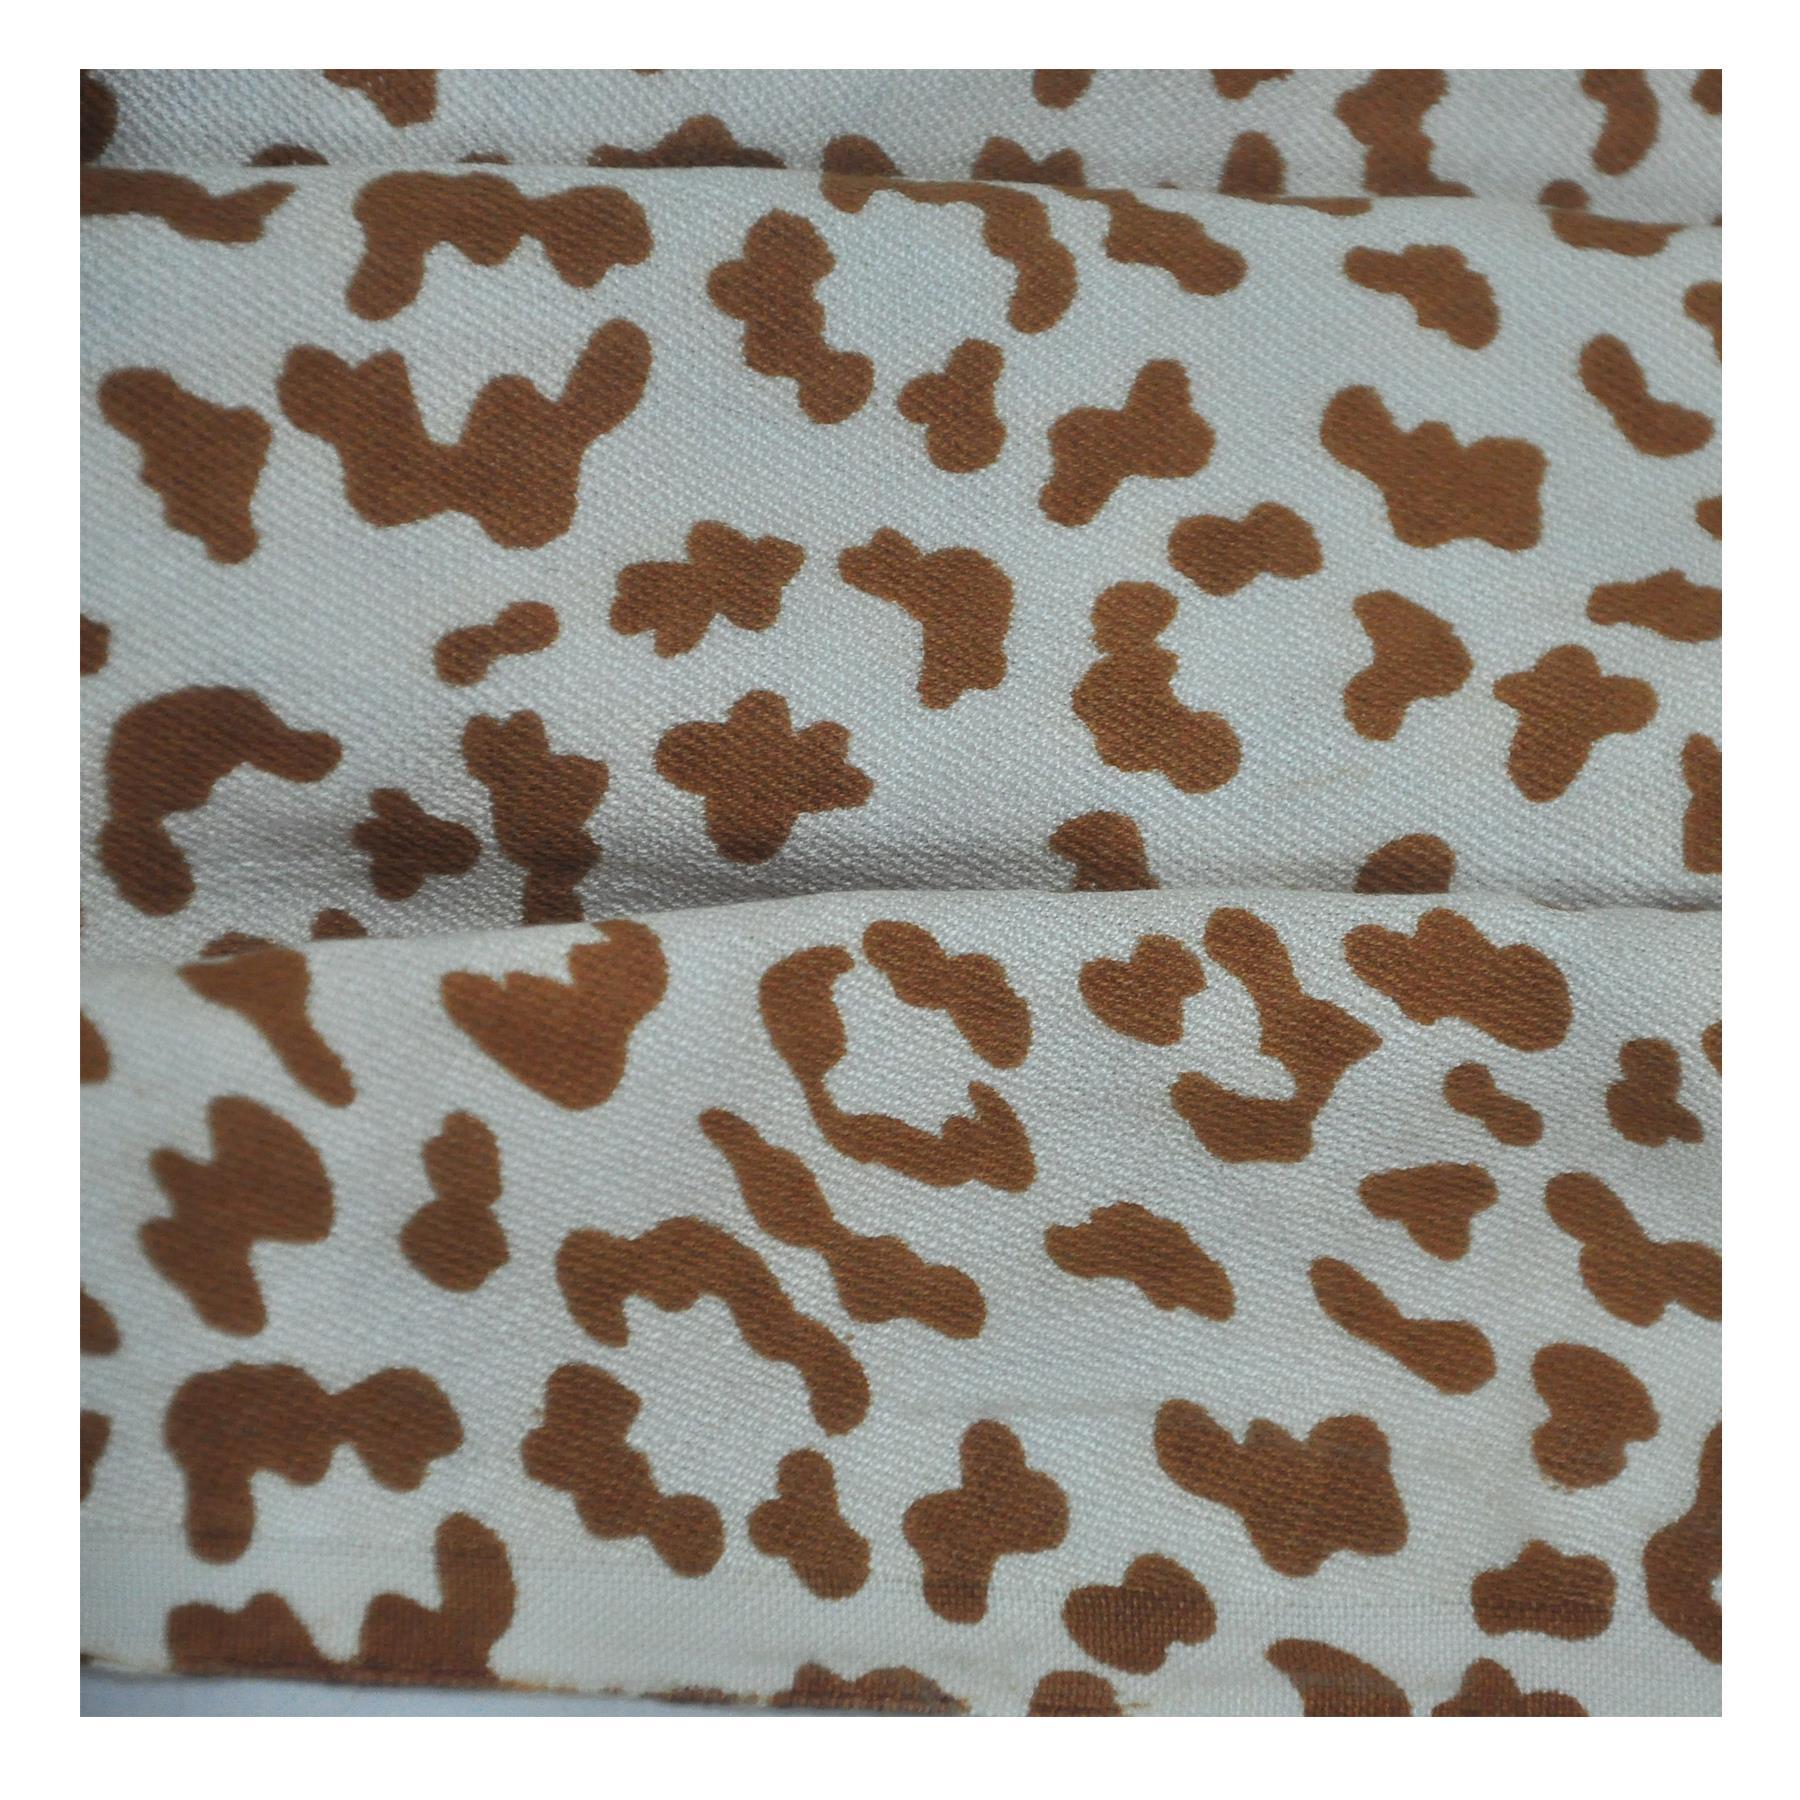 New-Leopard-Animal-Print-Soft-Warm-Winter-Head-Scarf-Shawl-Neck-Wrap thumbnail 3